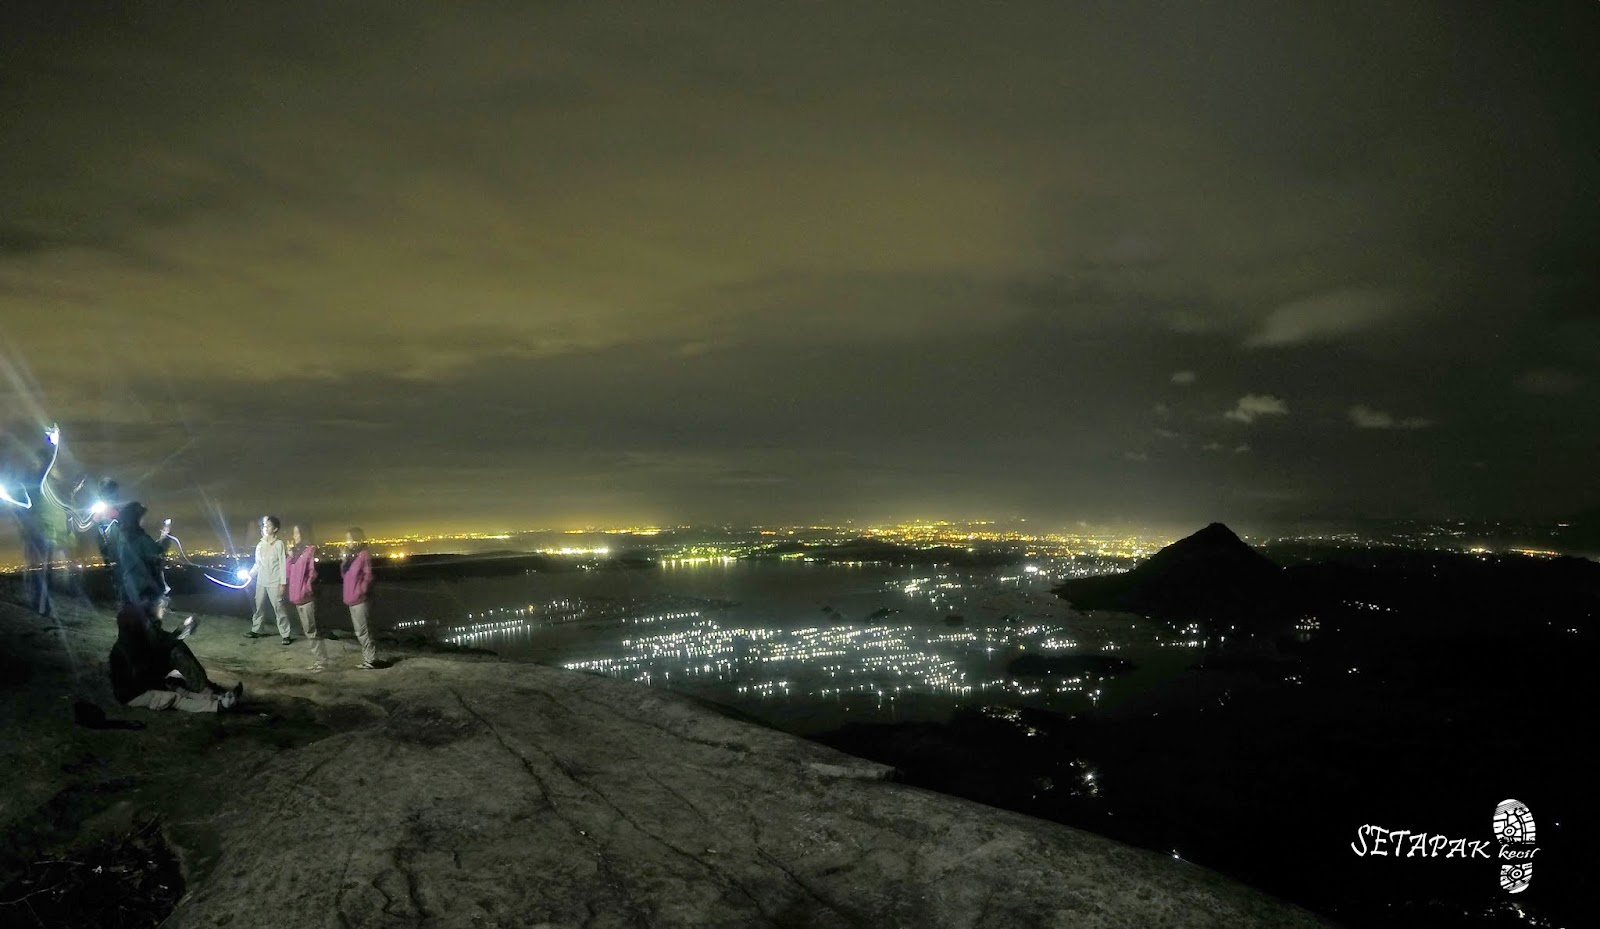 Setapak Kecil Gunung Lembu Tak Terbayangkan Sebelumnya